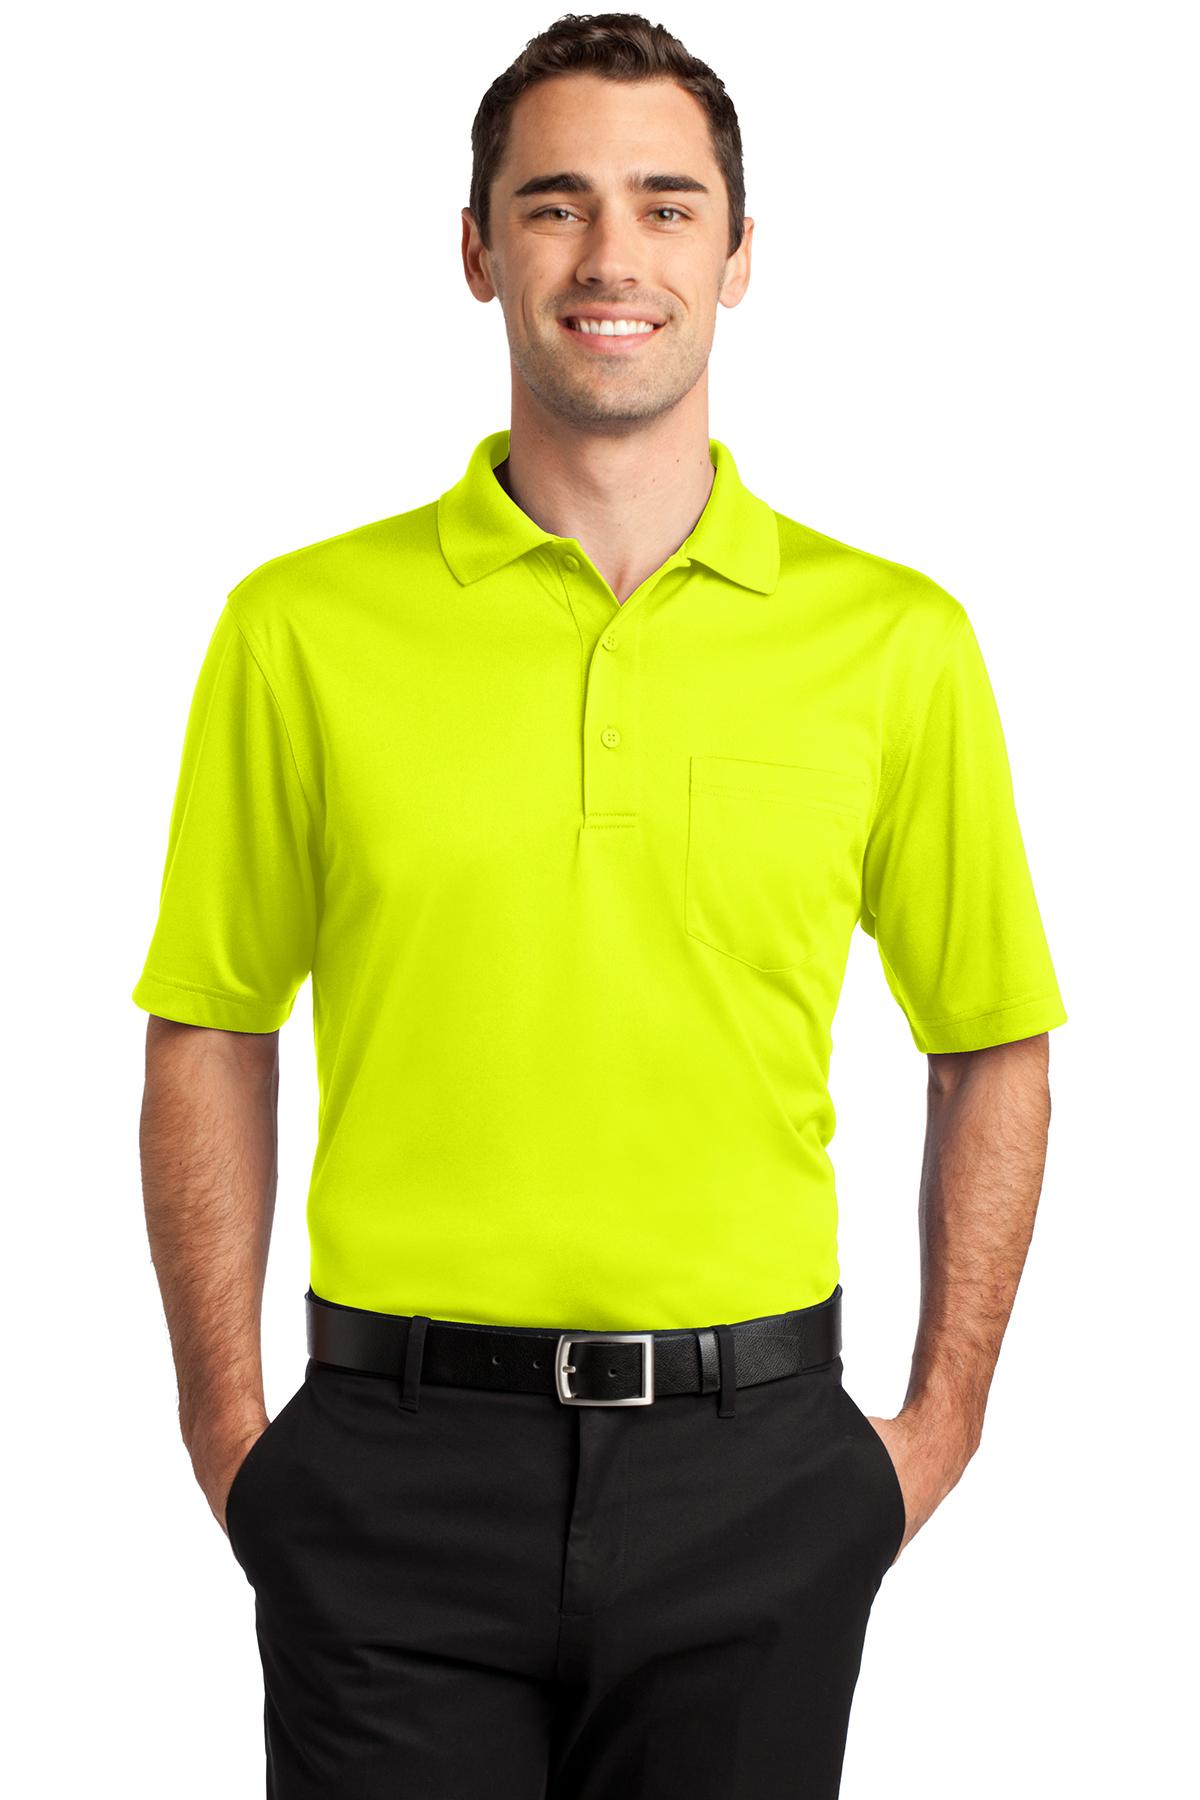 461af4f6 CornerStone® Select Snag-Proof Pocket Polo   Workwear   Polos ...